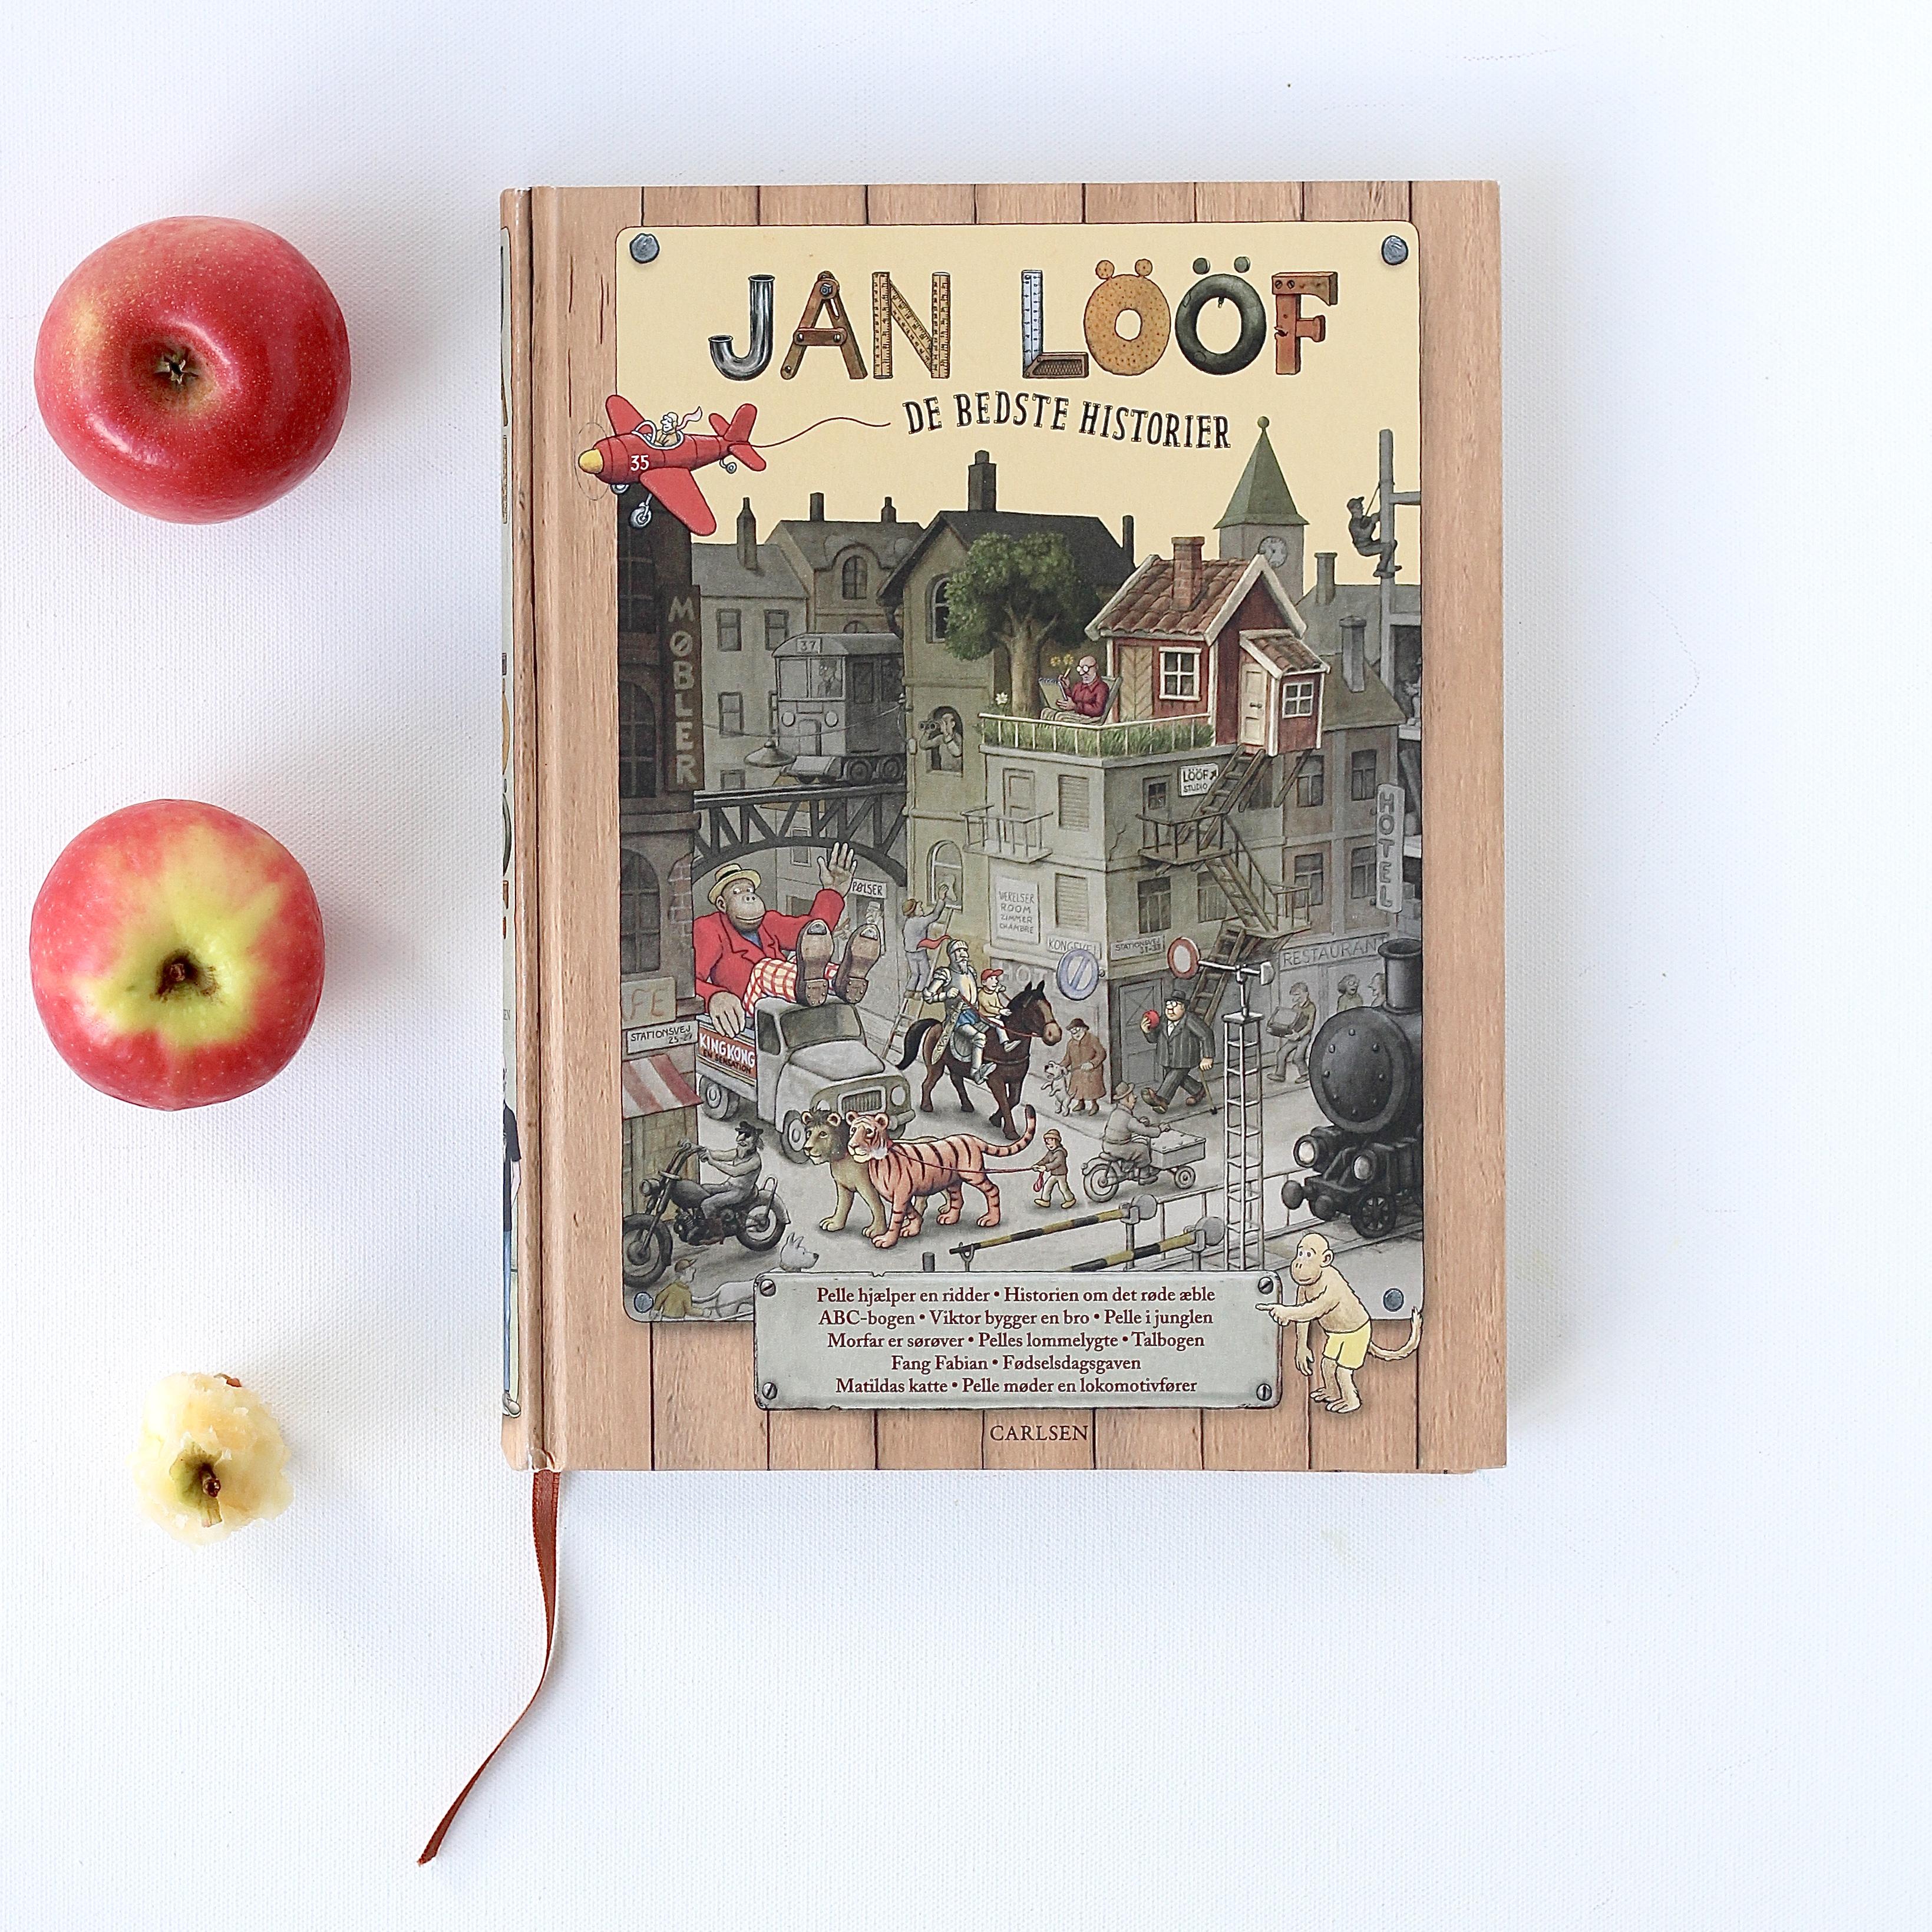 Jan Lööf, De bedste historier, Bogopelvelsen